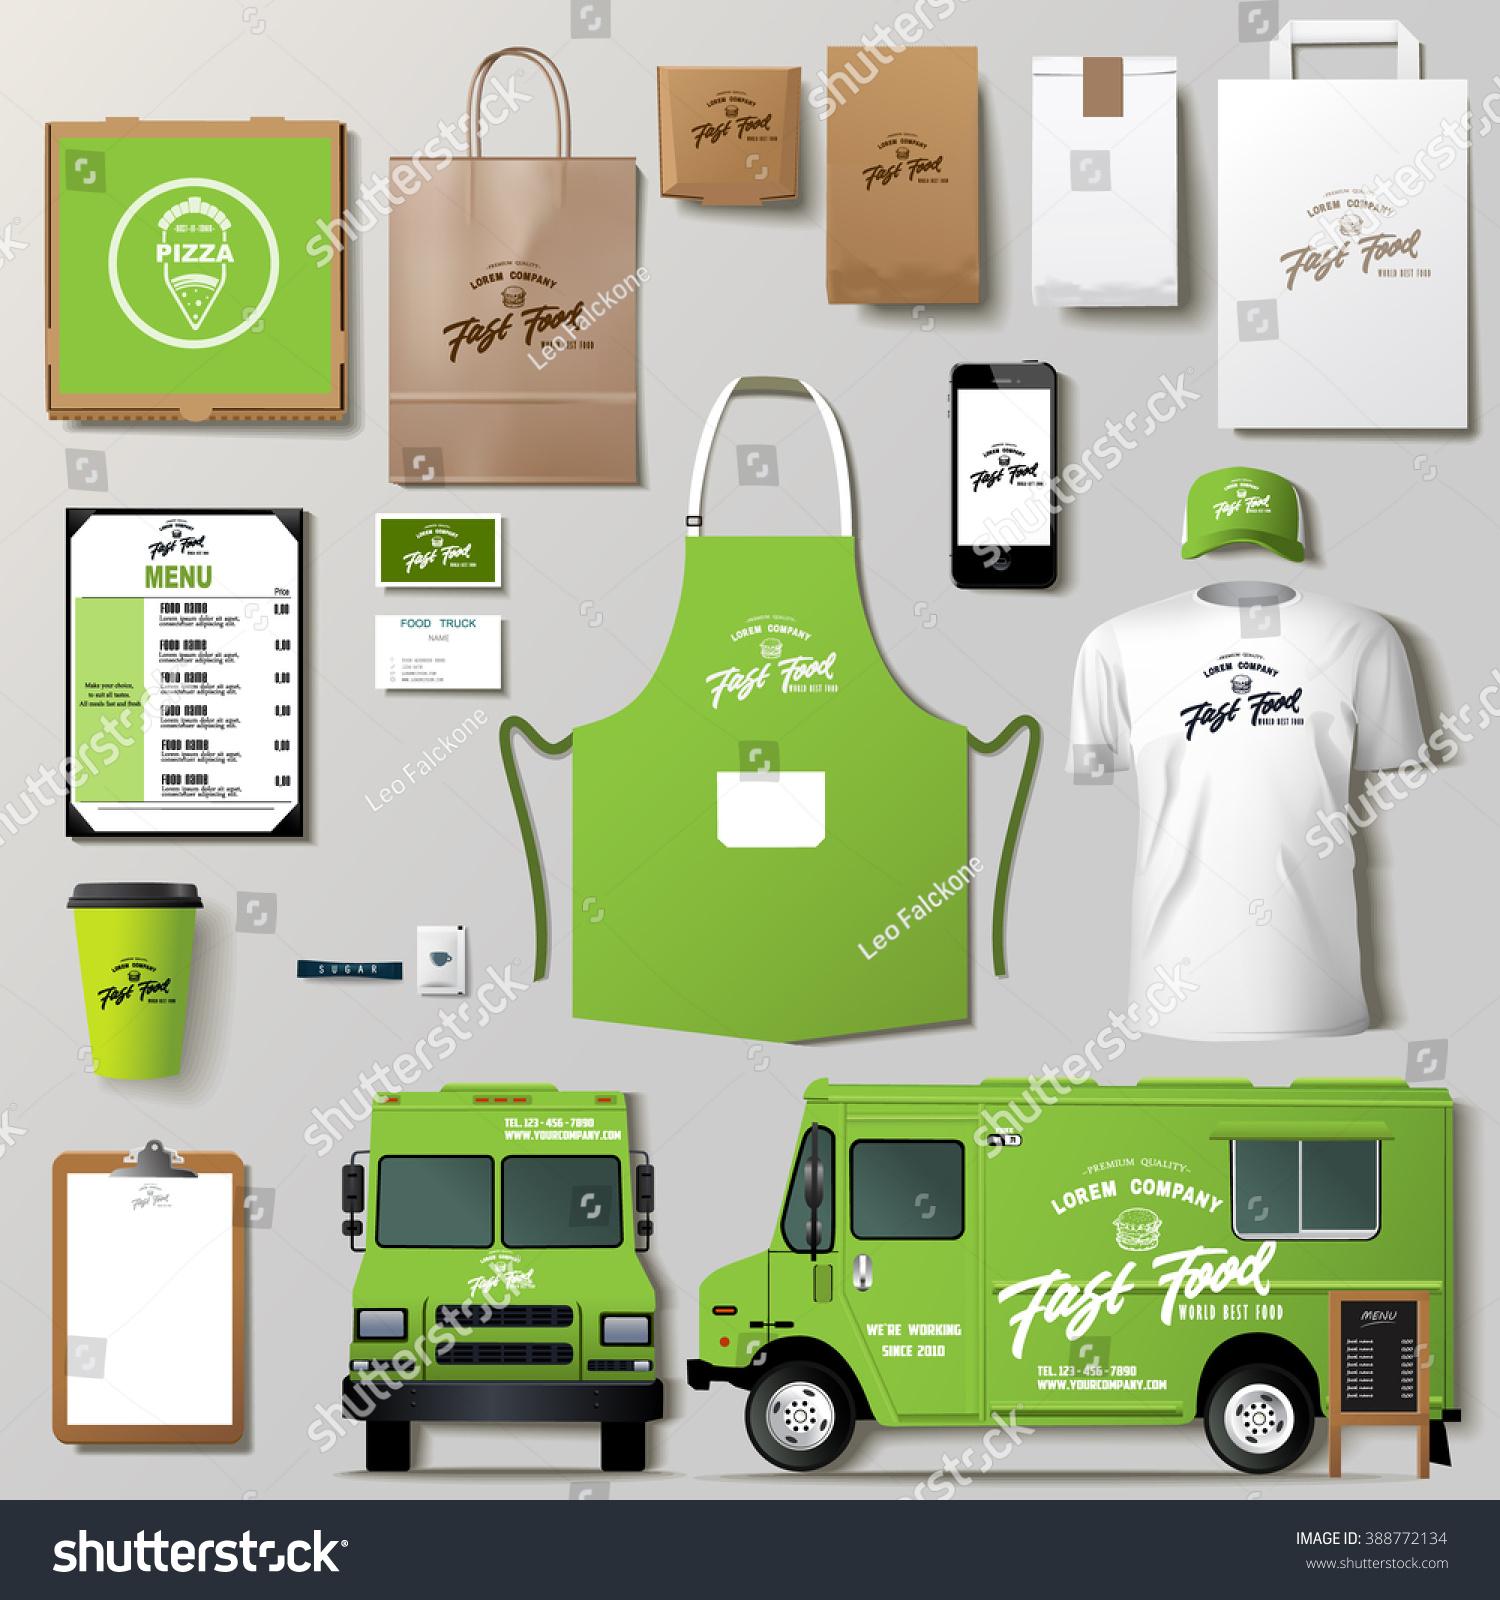 vector food truck corporate identity template stock vector 388772134 shutterstock. Black Bedroom Furniture Sets. Home Design Ideas